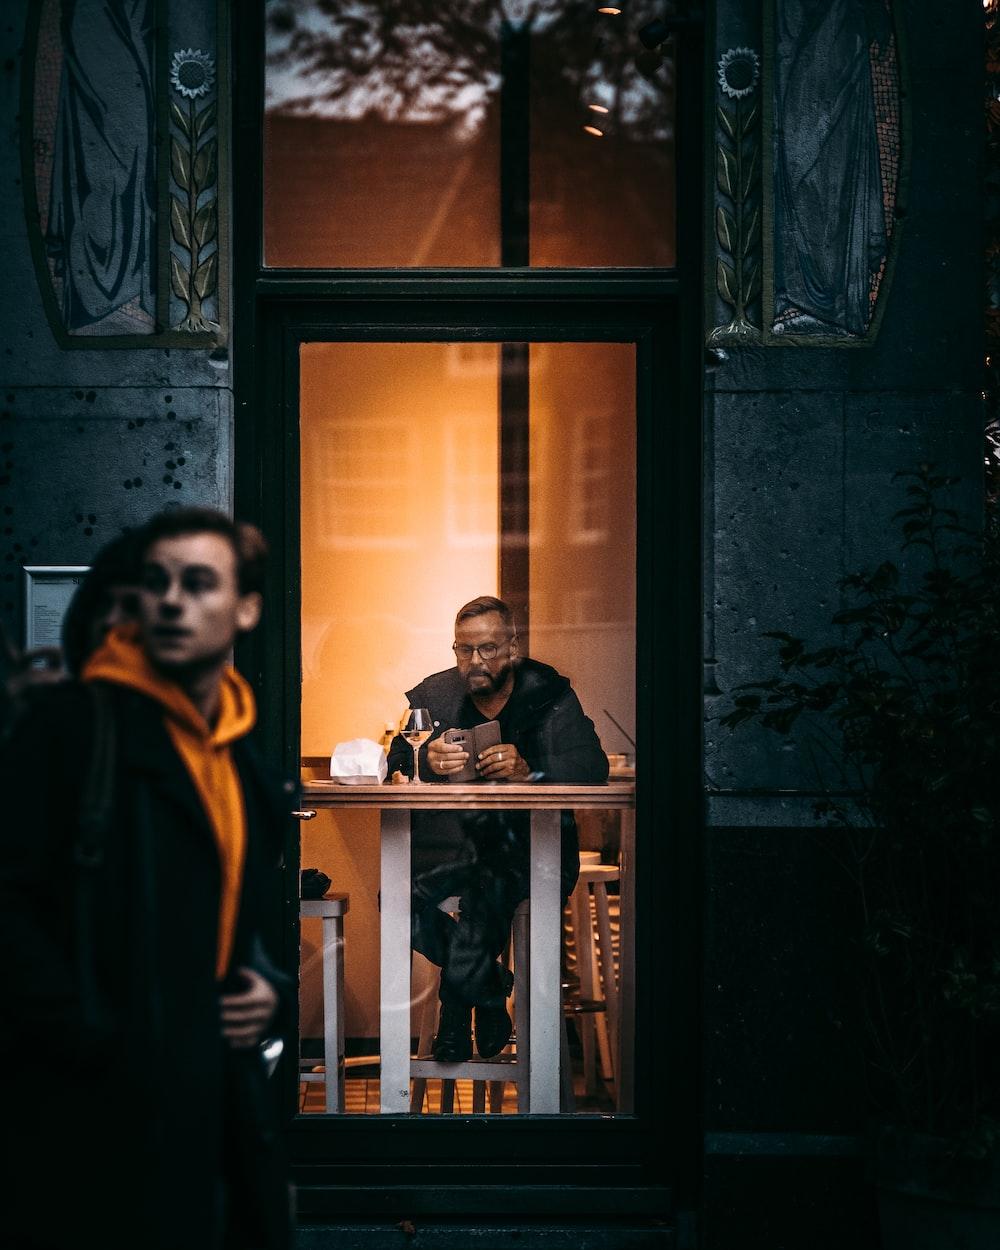 man sitting beside table